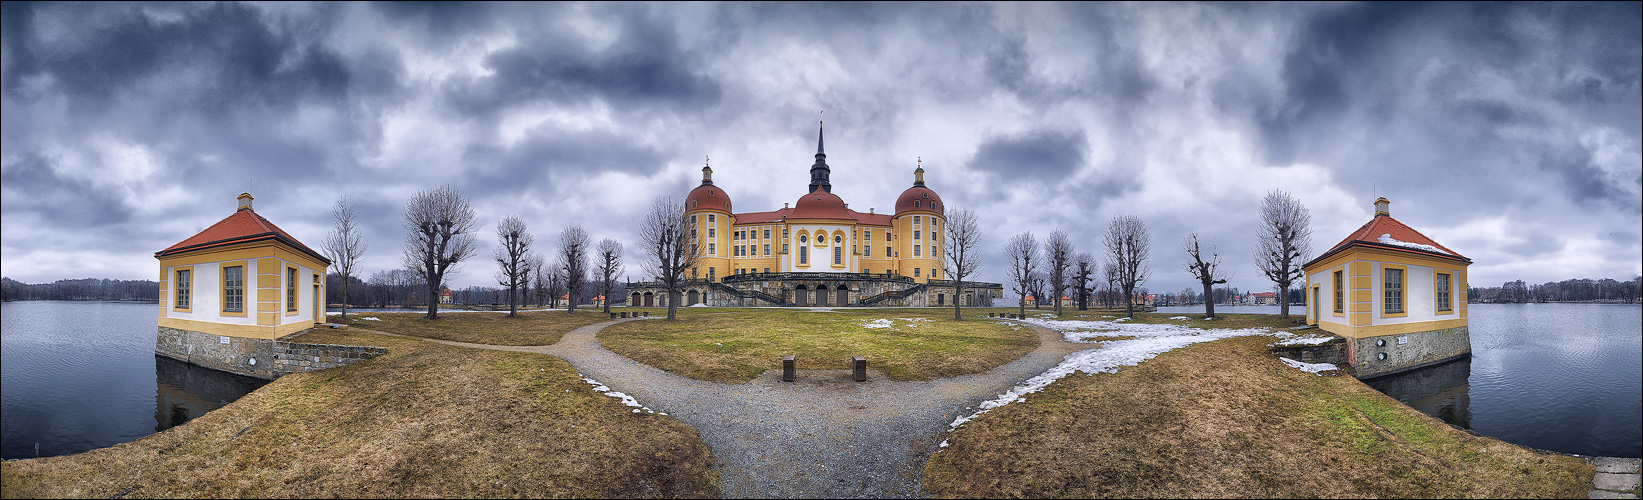 ... Moritzburg ...